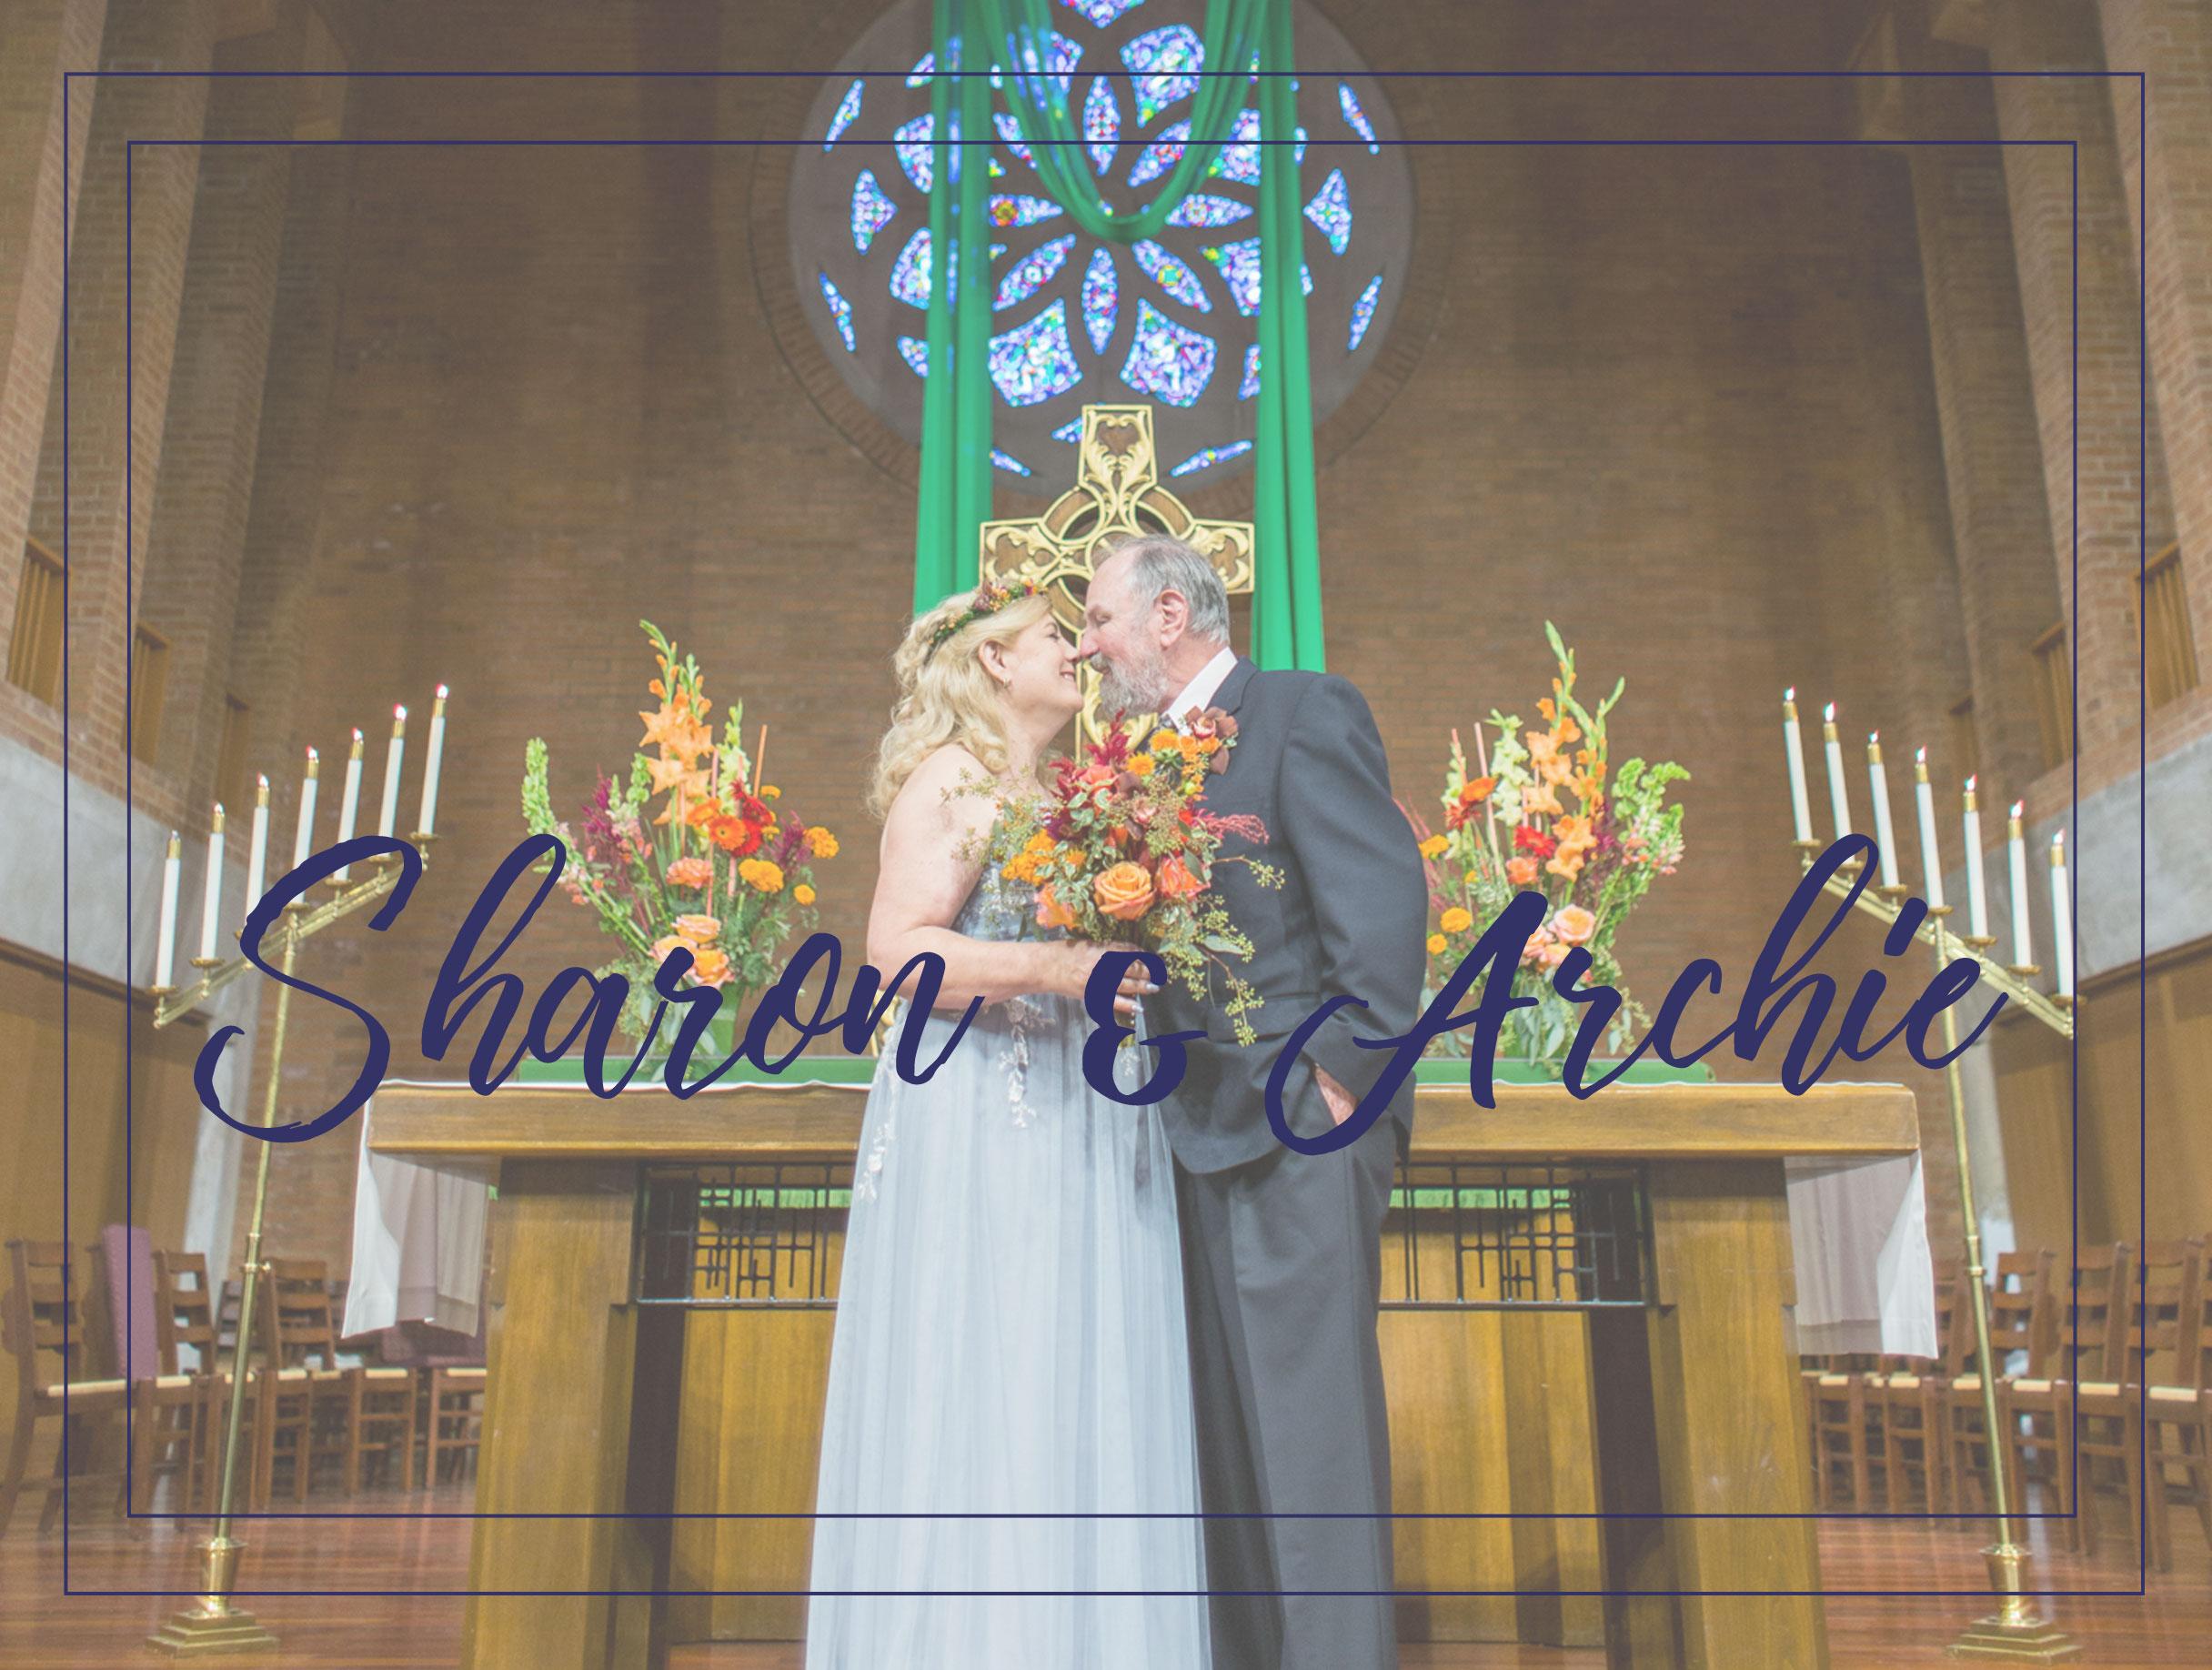 Teresa-Valencia-Photography-Methodist-Cathedral-Wrigley-Mansion-Wedding-Sharon-And-Archie.jpg